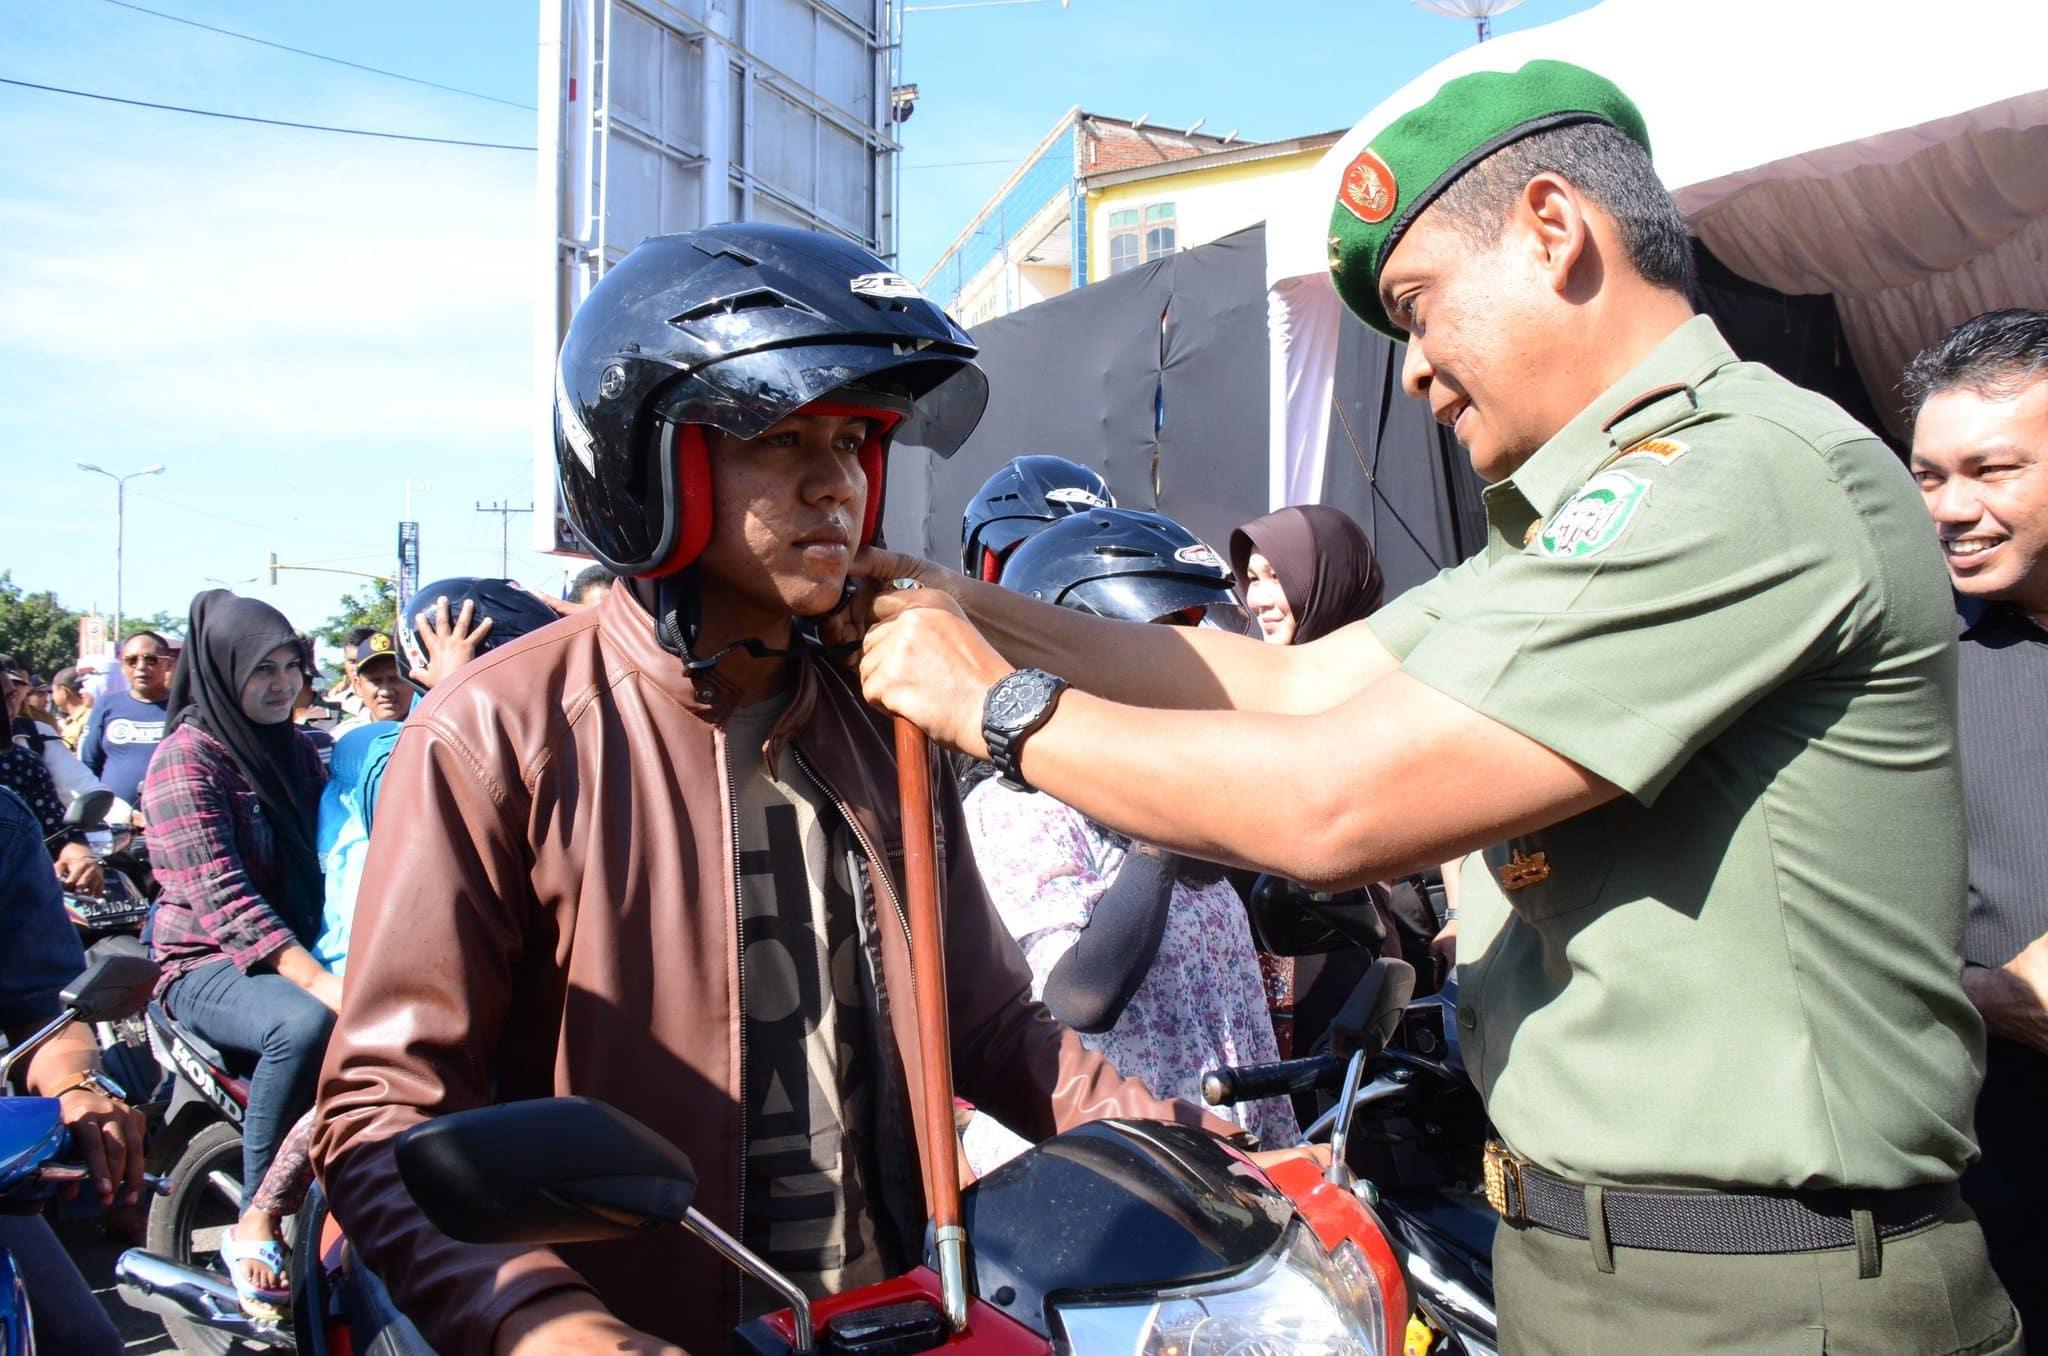 Pangdam IM Dukung Deklarasi Menuju Indonesia Tertib Bersatu Untuk Keselamatan No. 1 Tahun 2015